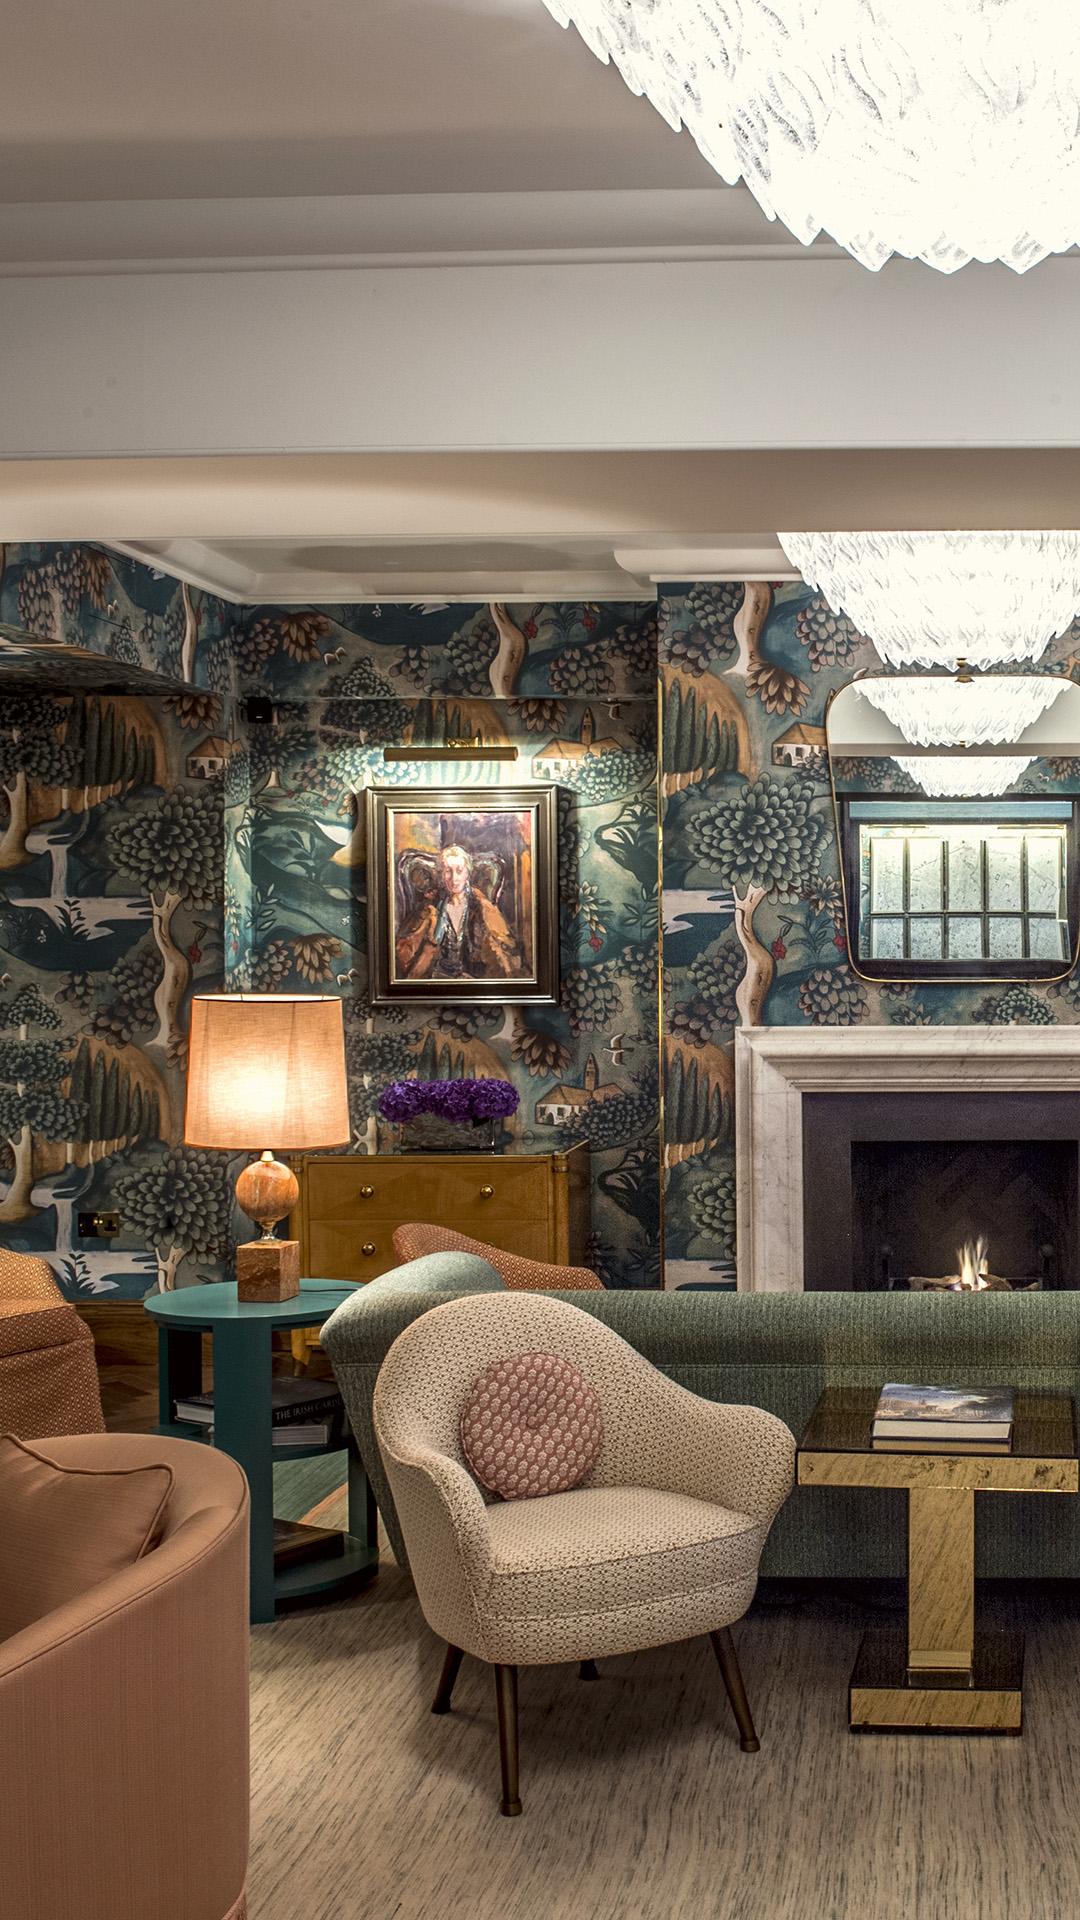 Luxury Hotel Rooms: Luxury Hotel In London's West End